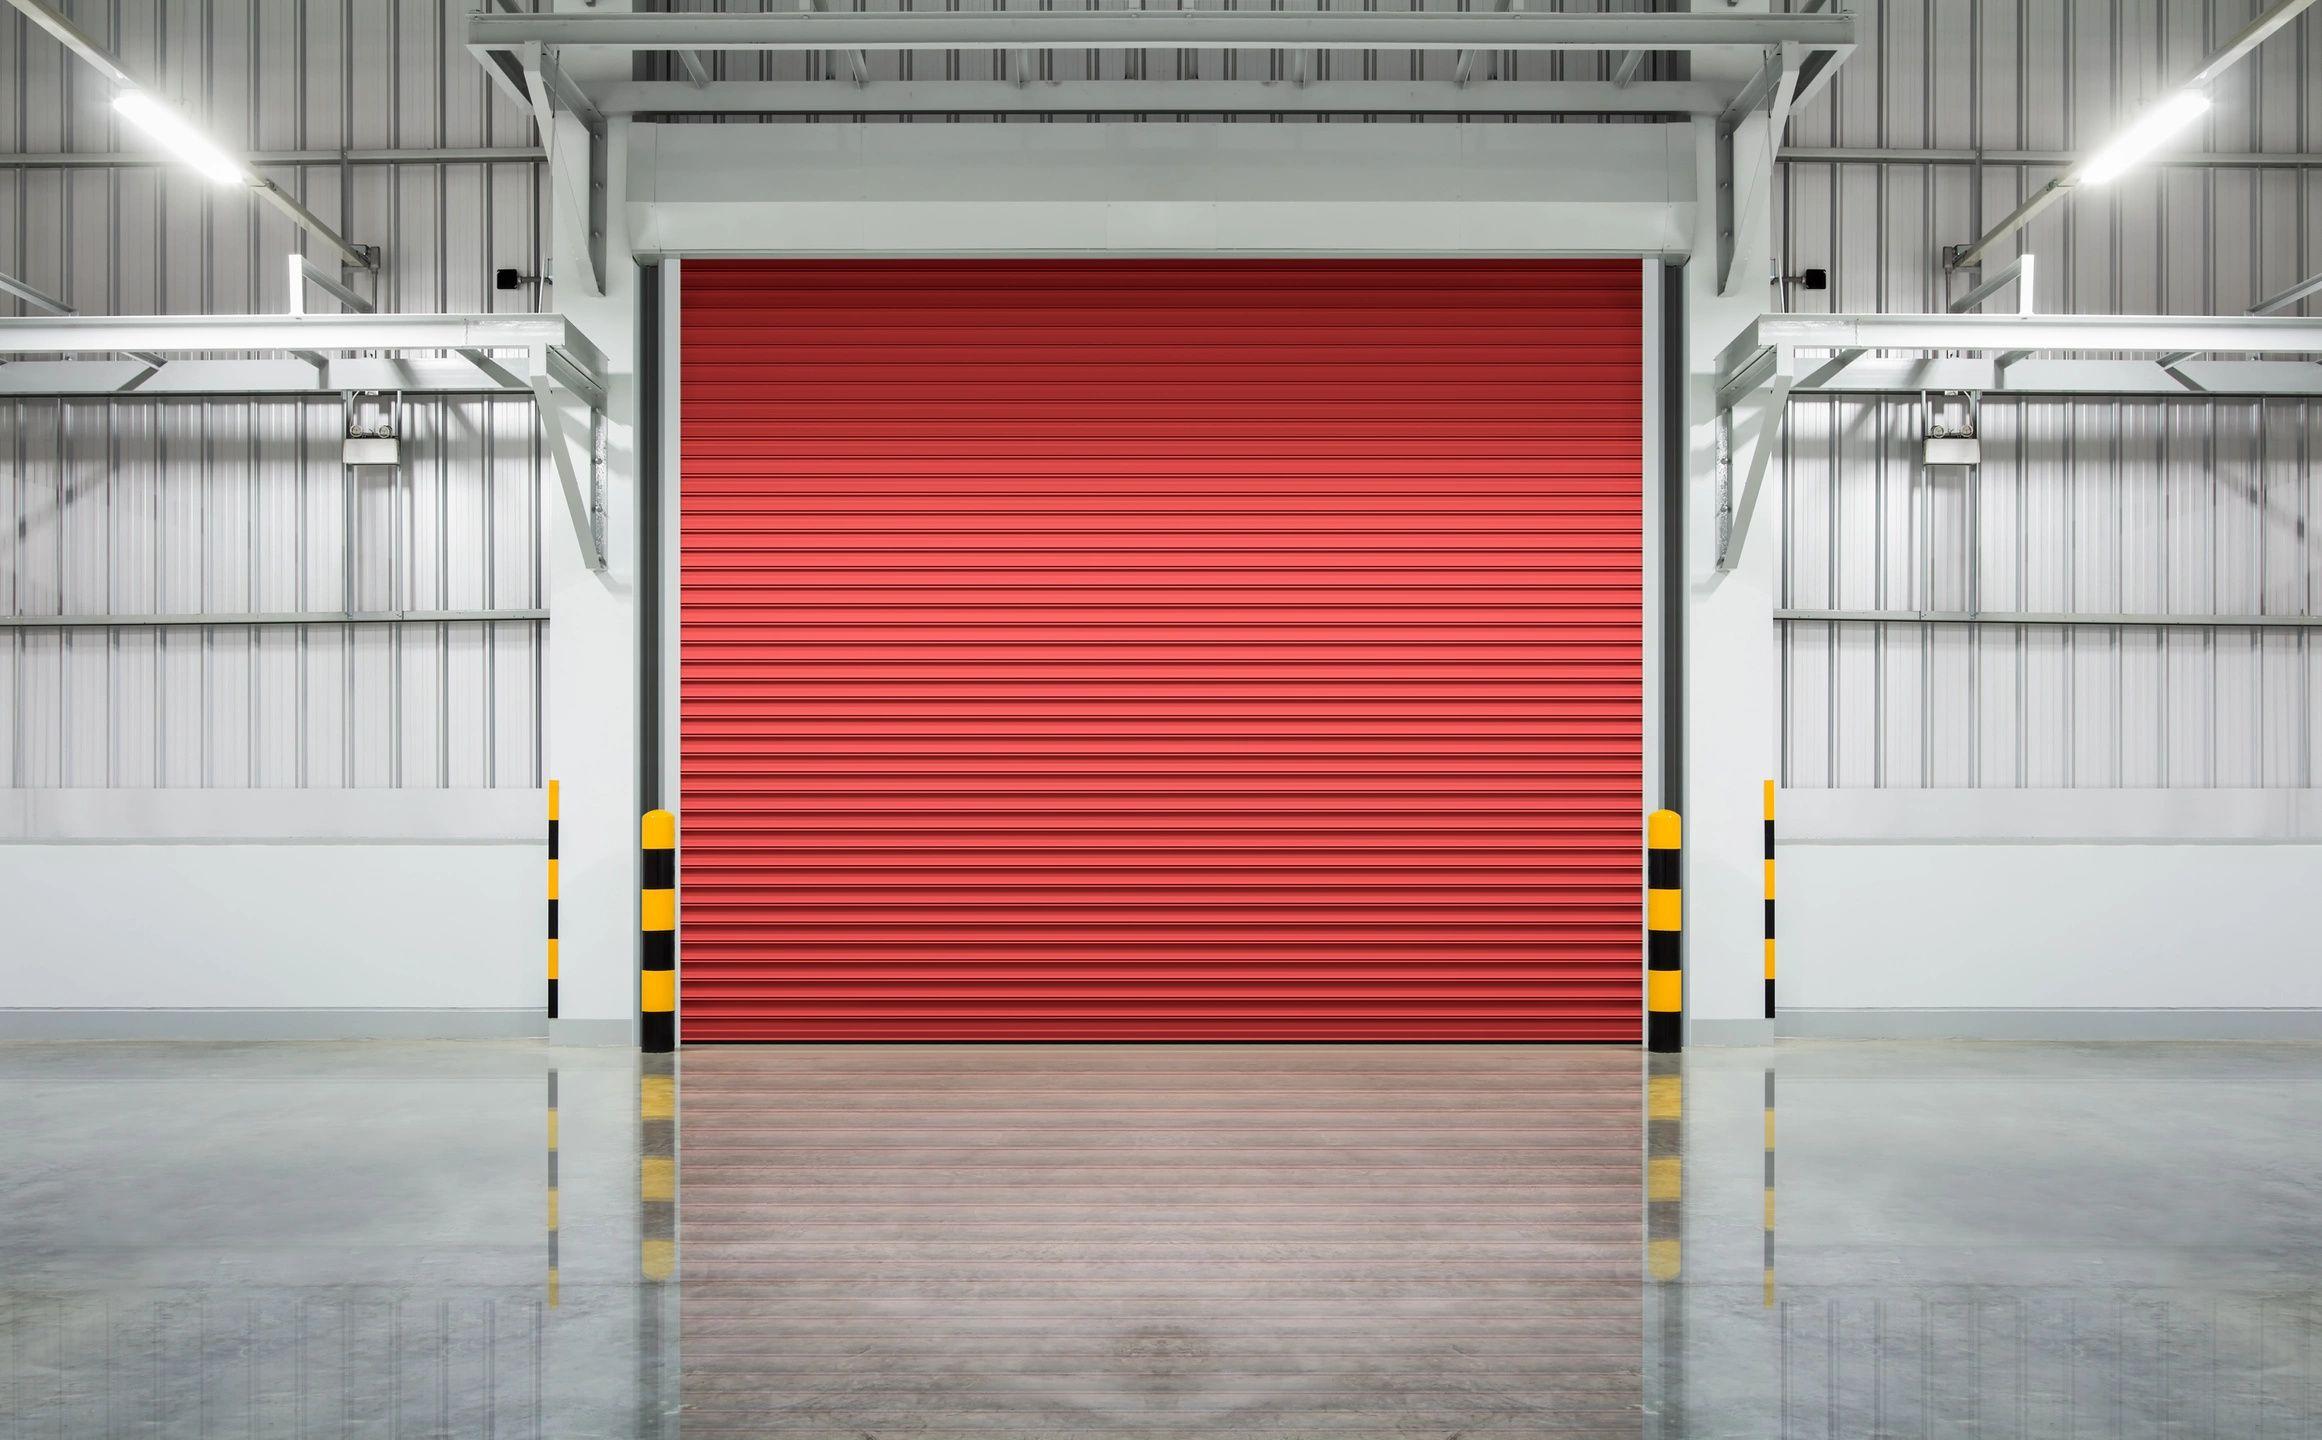 Garage door austin emergency repairs installations openers commercial garage doors austin round rock cedar park tx solutioingenieria Choice Image